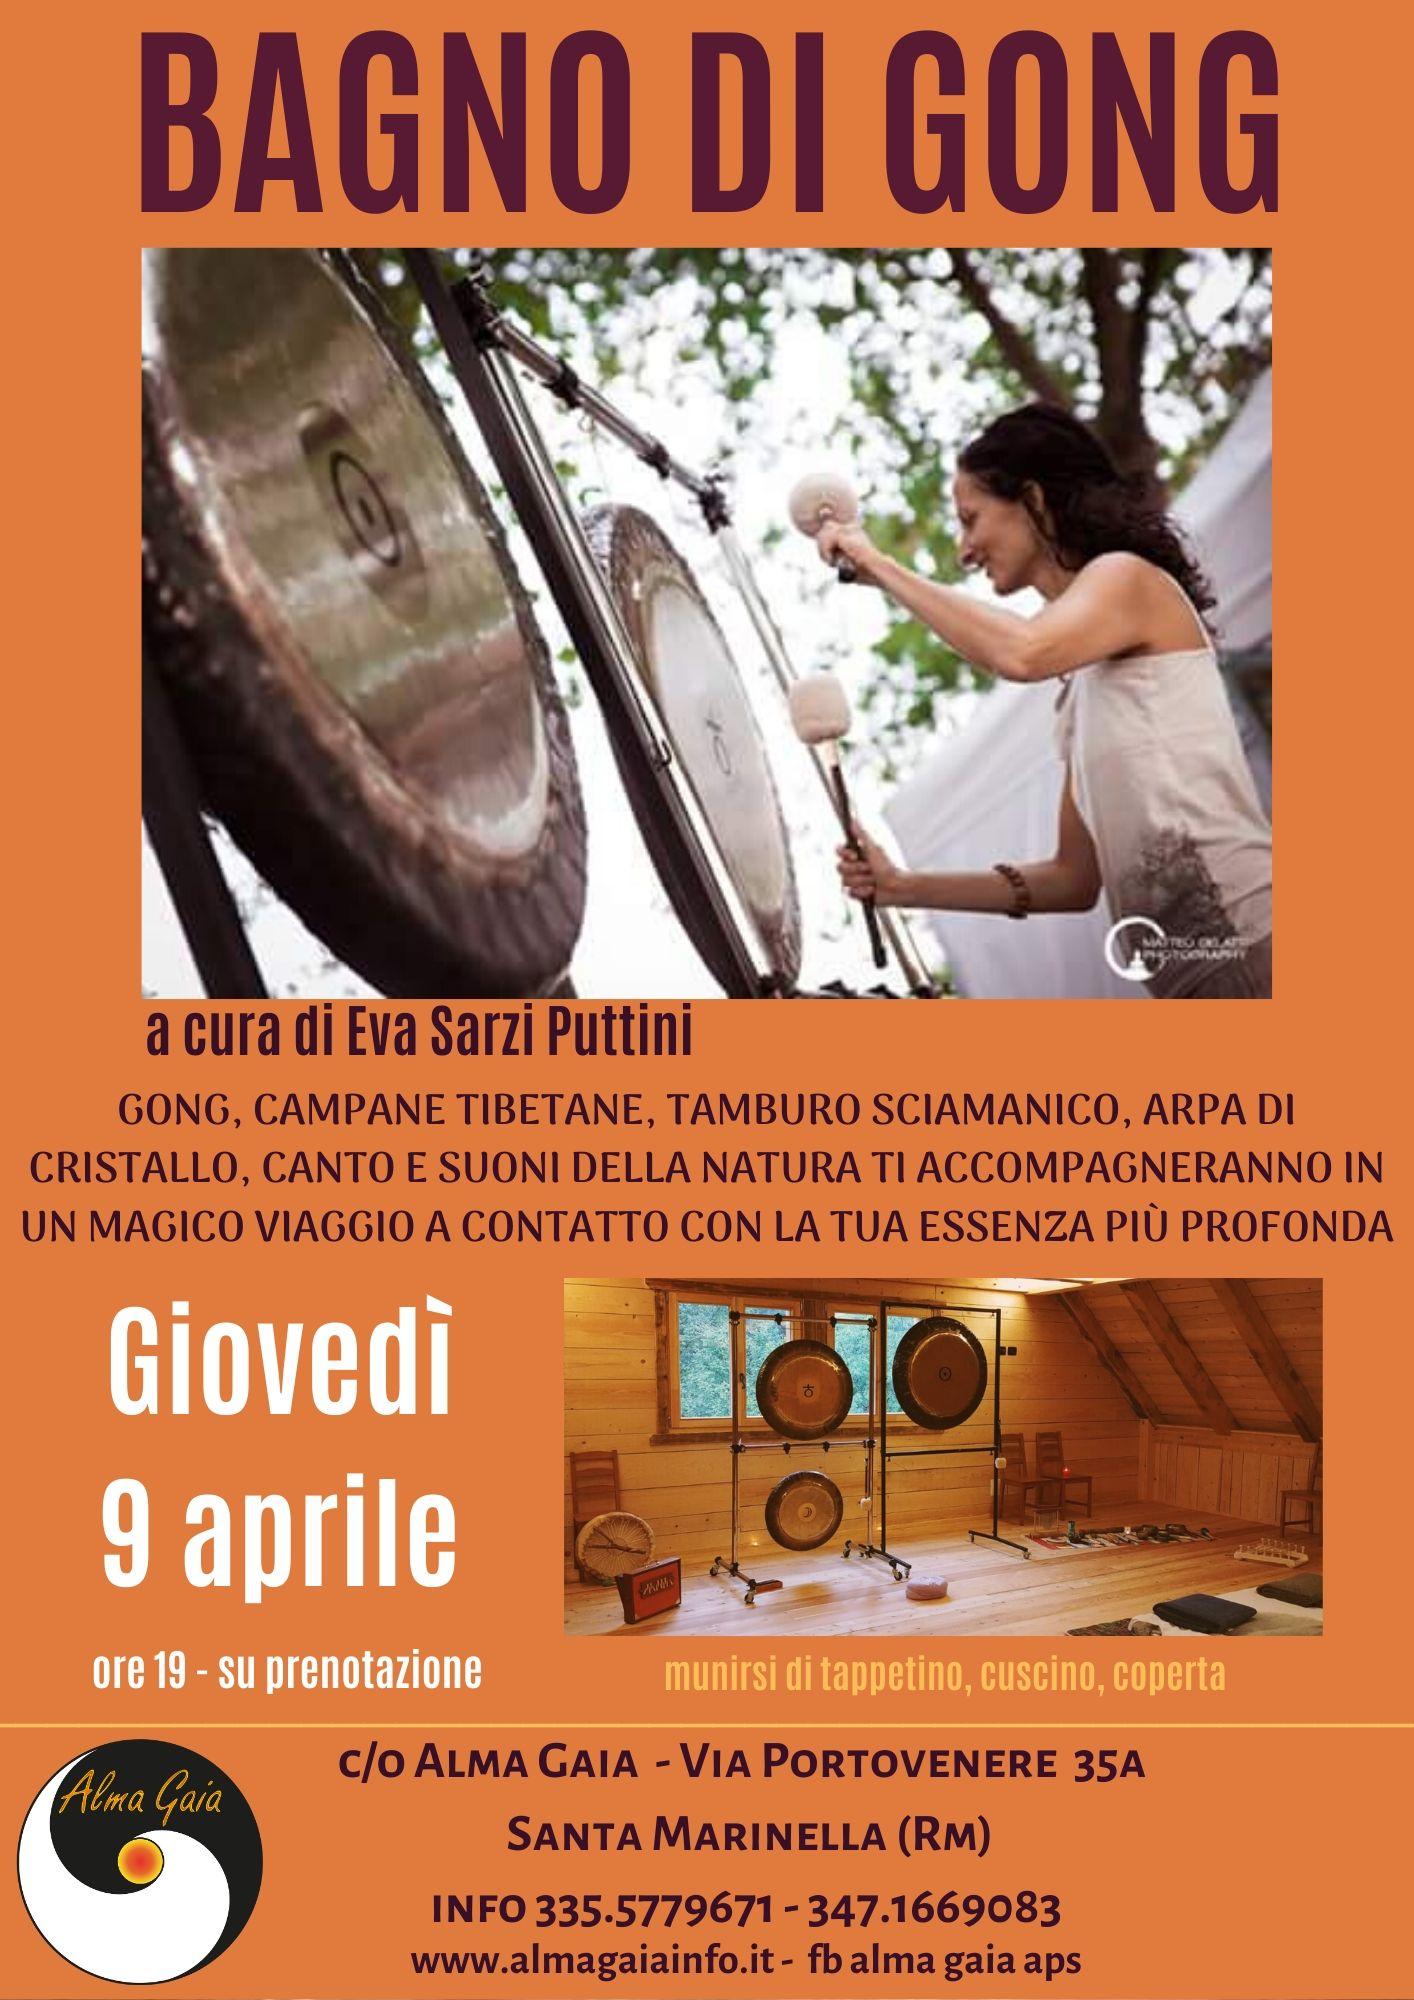 BAGNO DI GONG, Giovedì 9 aprile 2020